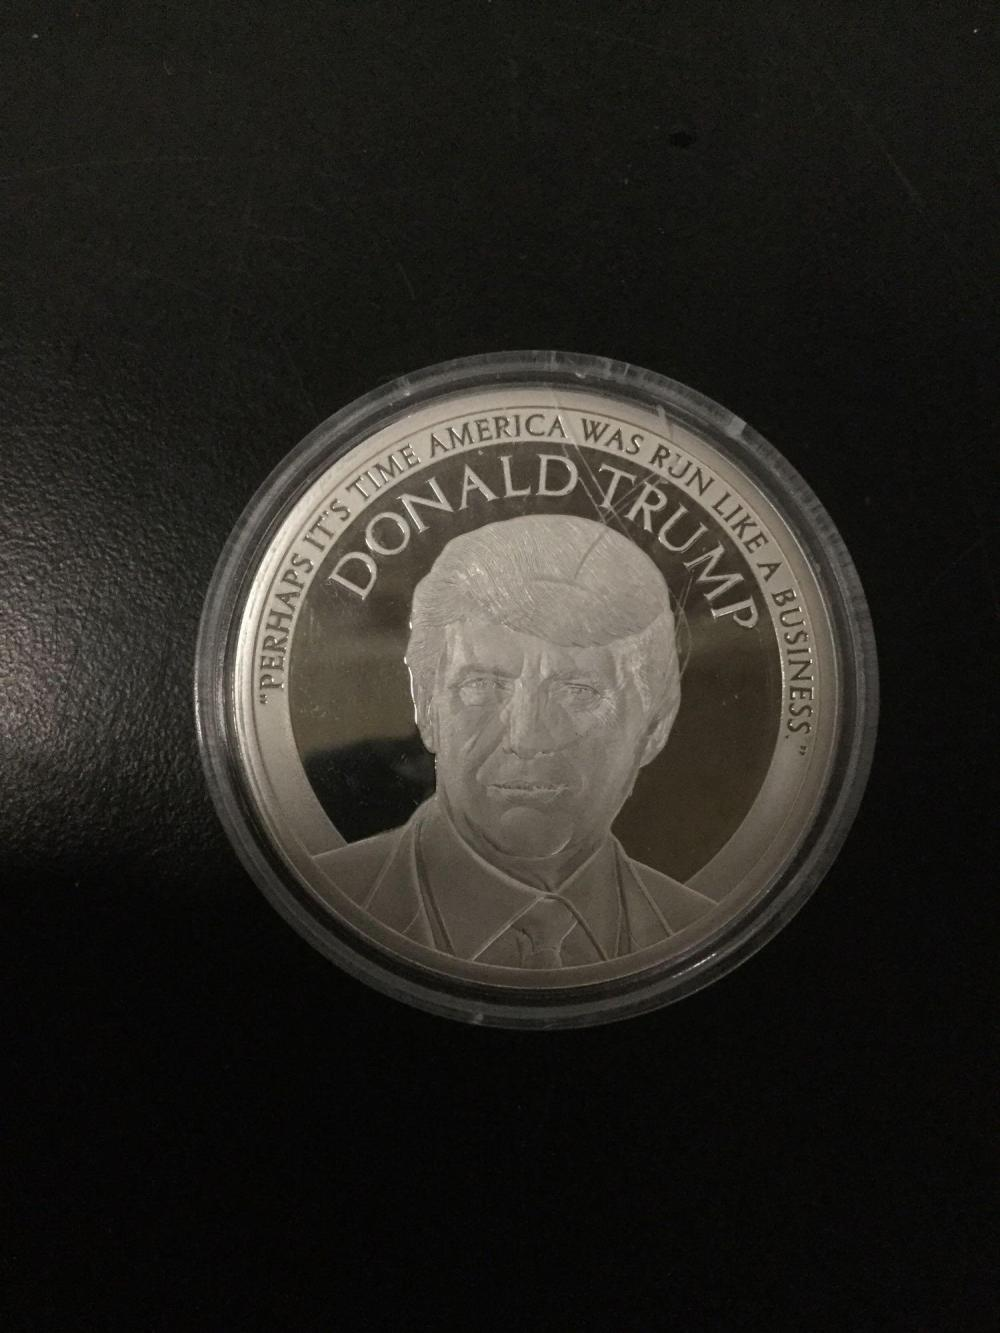 Lot 176: Donald Trump Make America Great Again 1 Oz Silver Round Coin